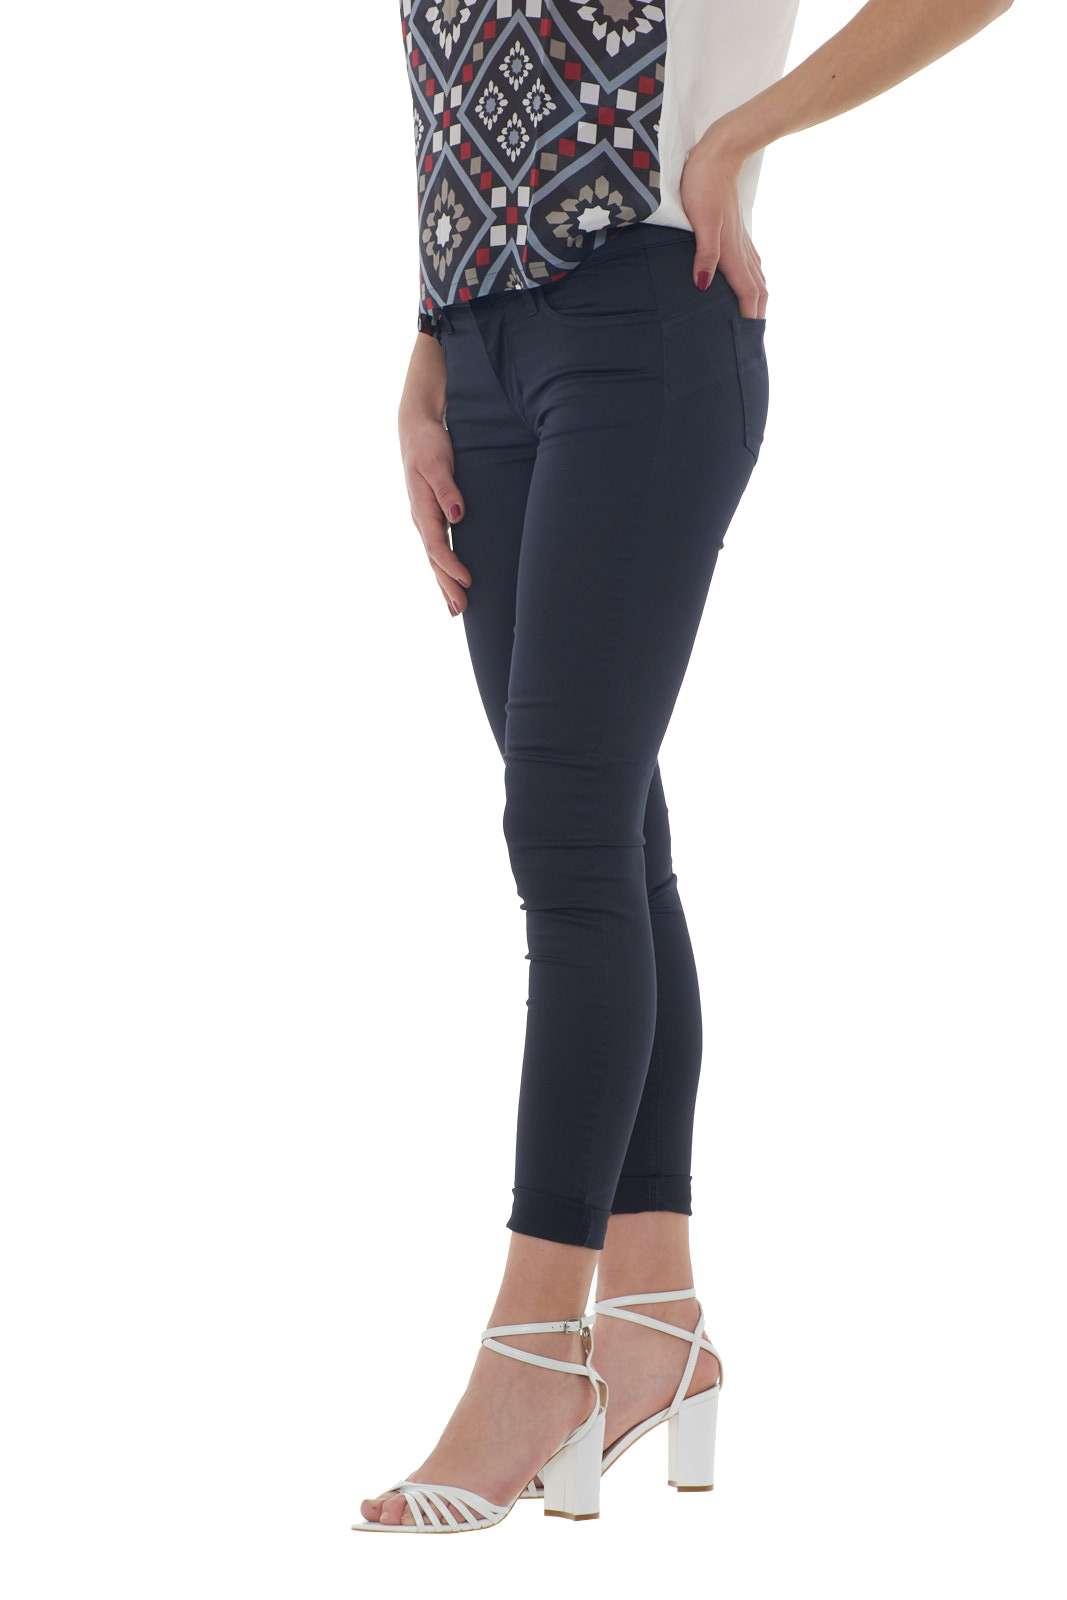 https://www.parmax.com/media/catalog/product/a/i/PE-outlet_parmax-pantaloni-donna-Liu-Jo-w17167-B.jpg